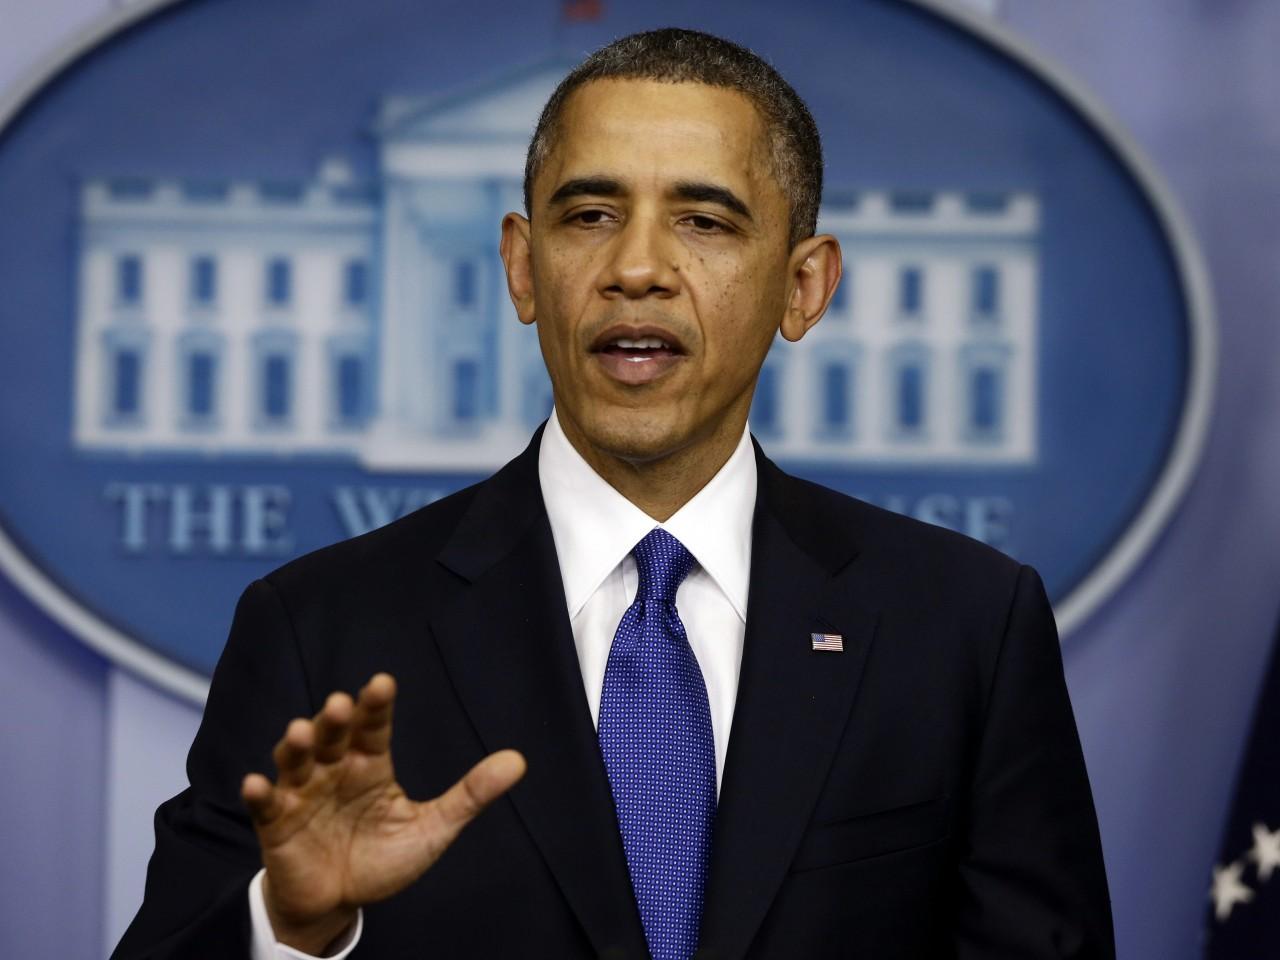 Barack Obama; Barack Obama; Barack Obama ...